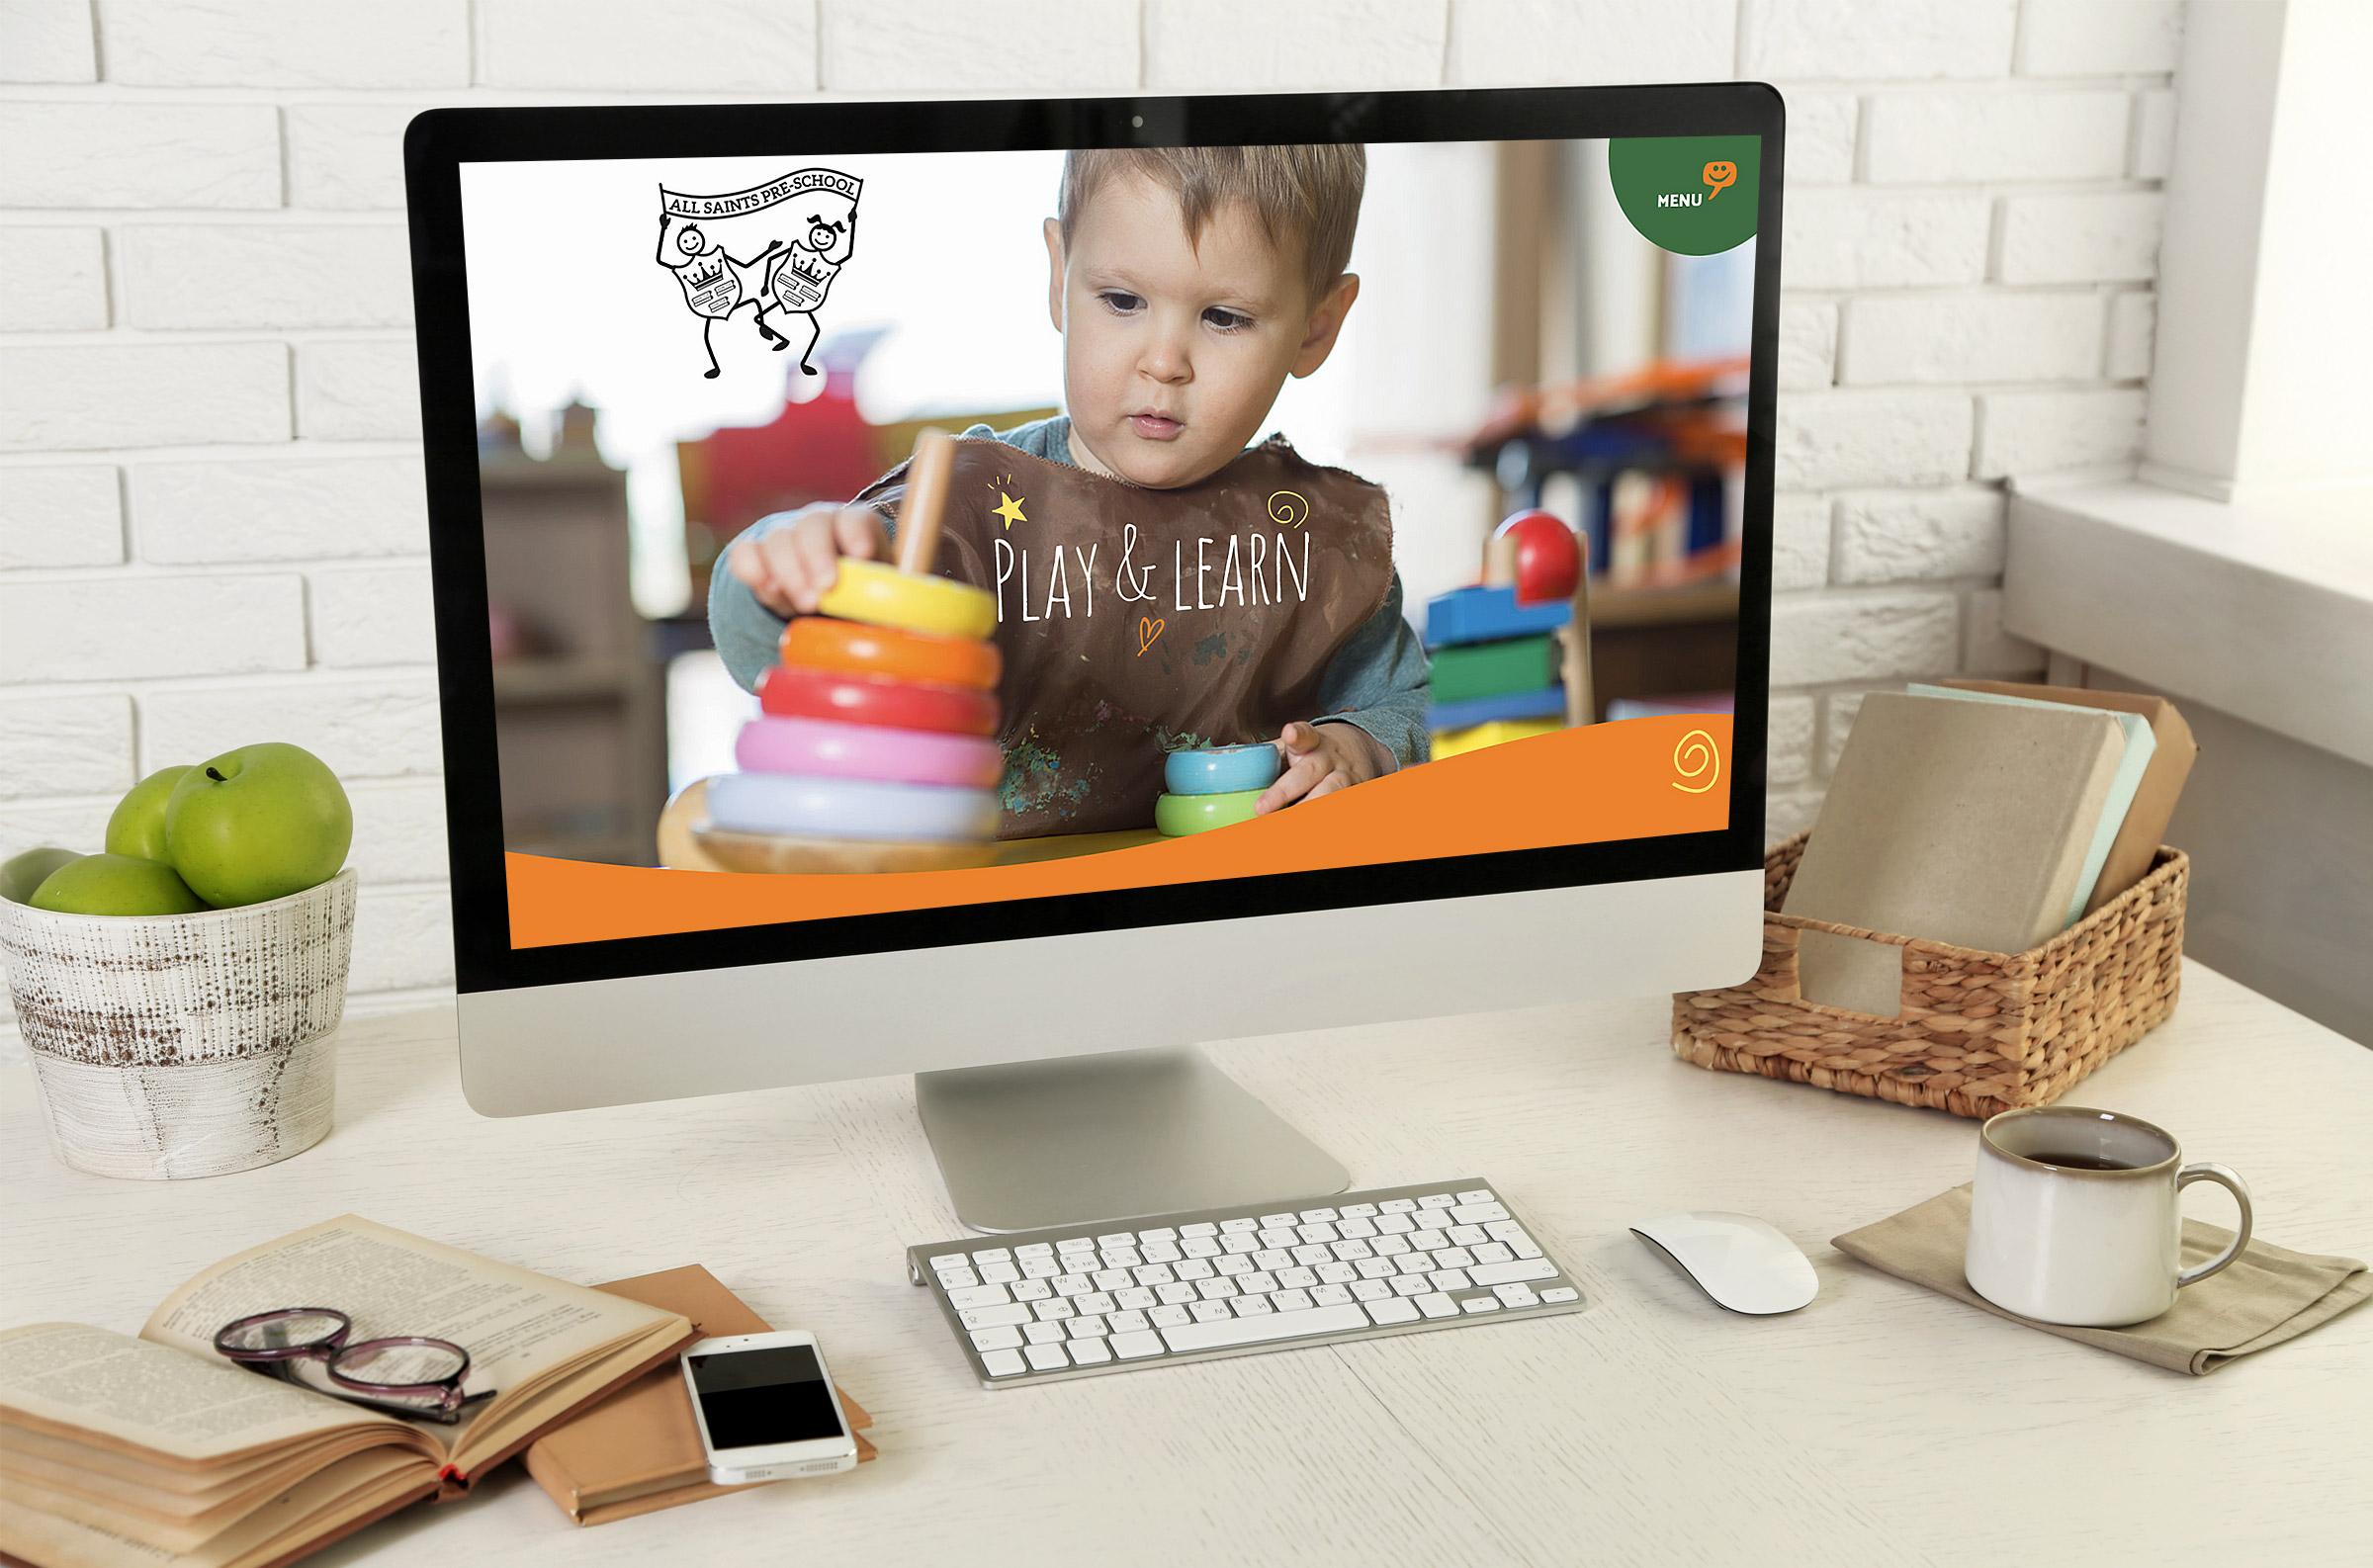 All saints pre-school website design